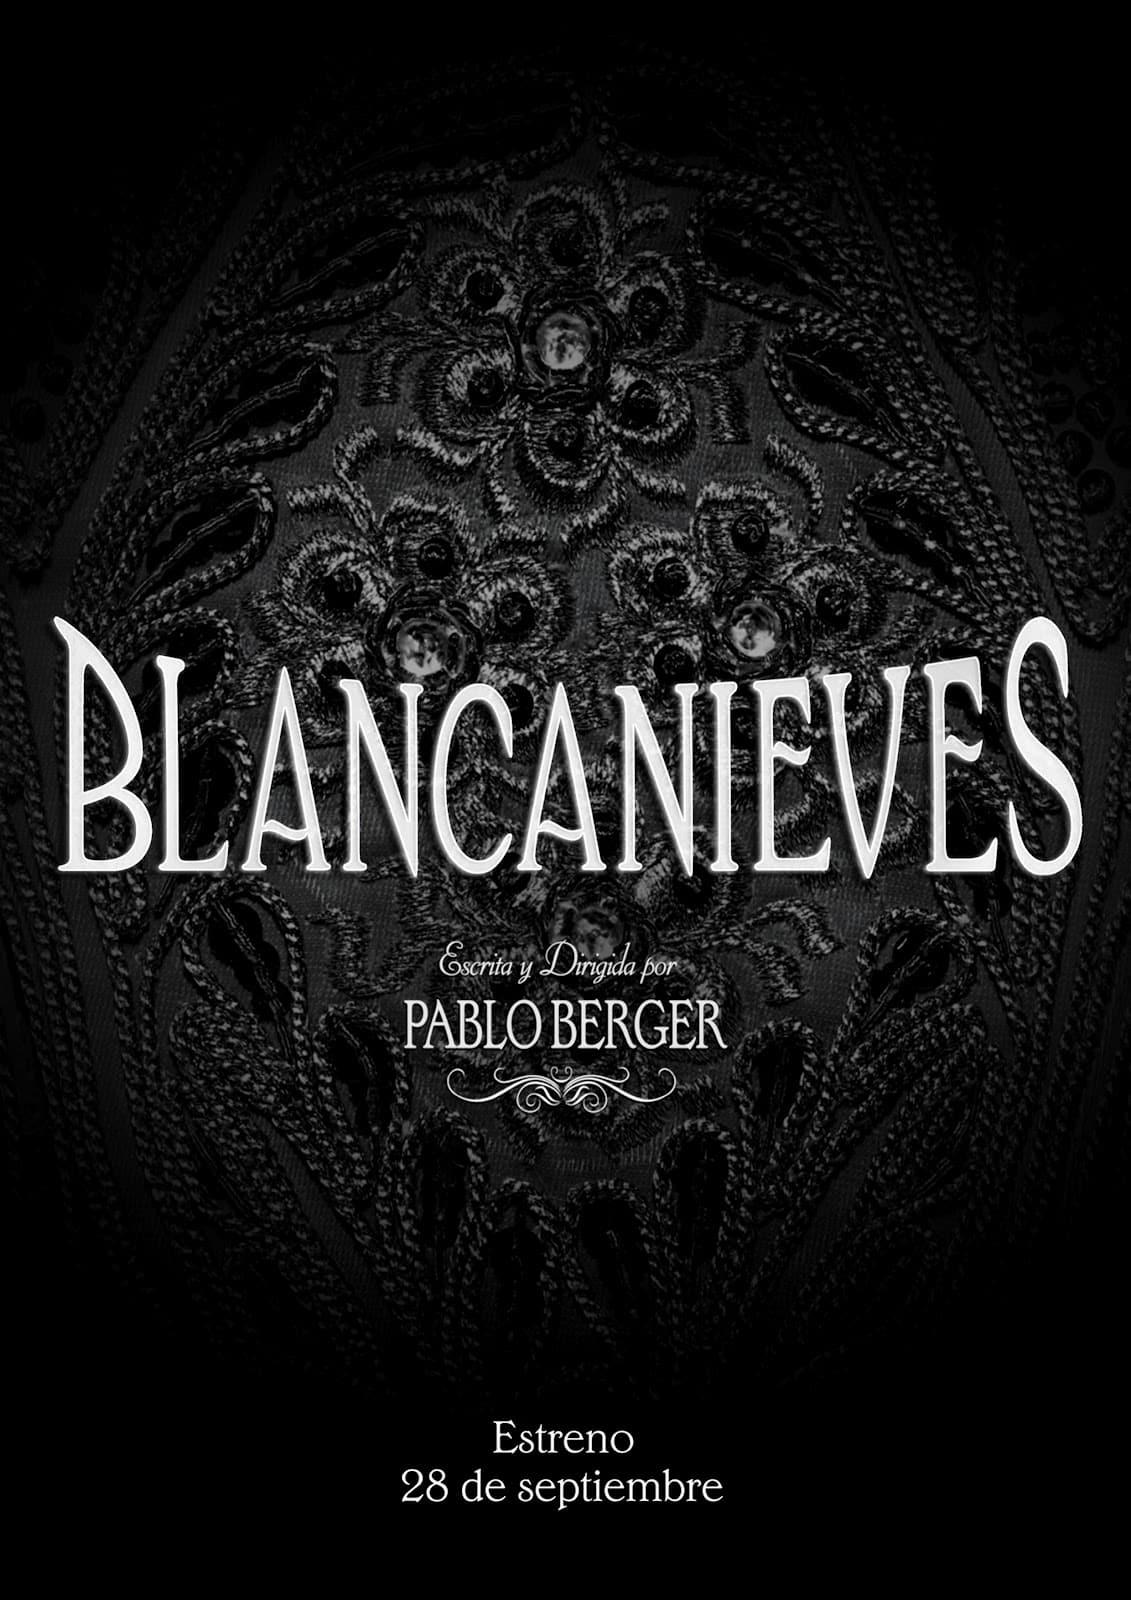 Blancanieves, Pablo Berger